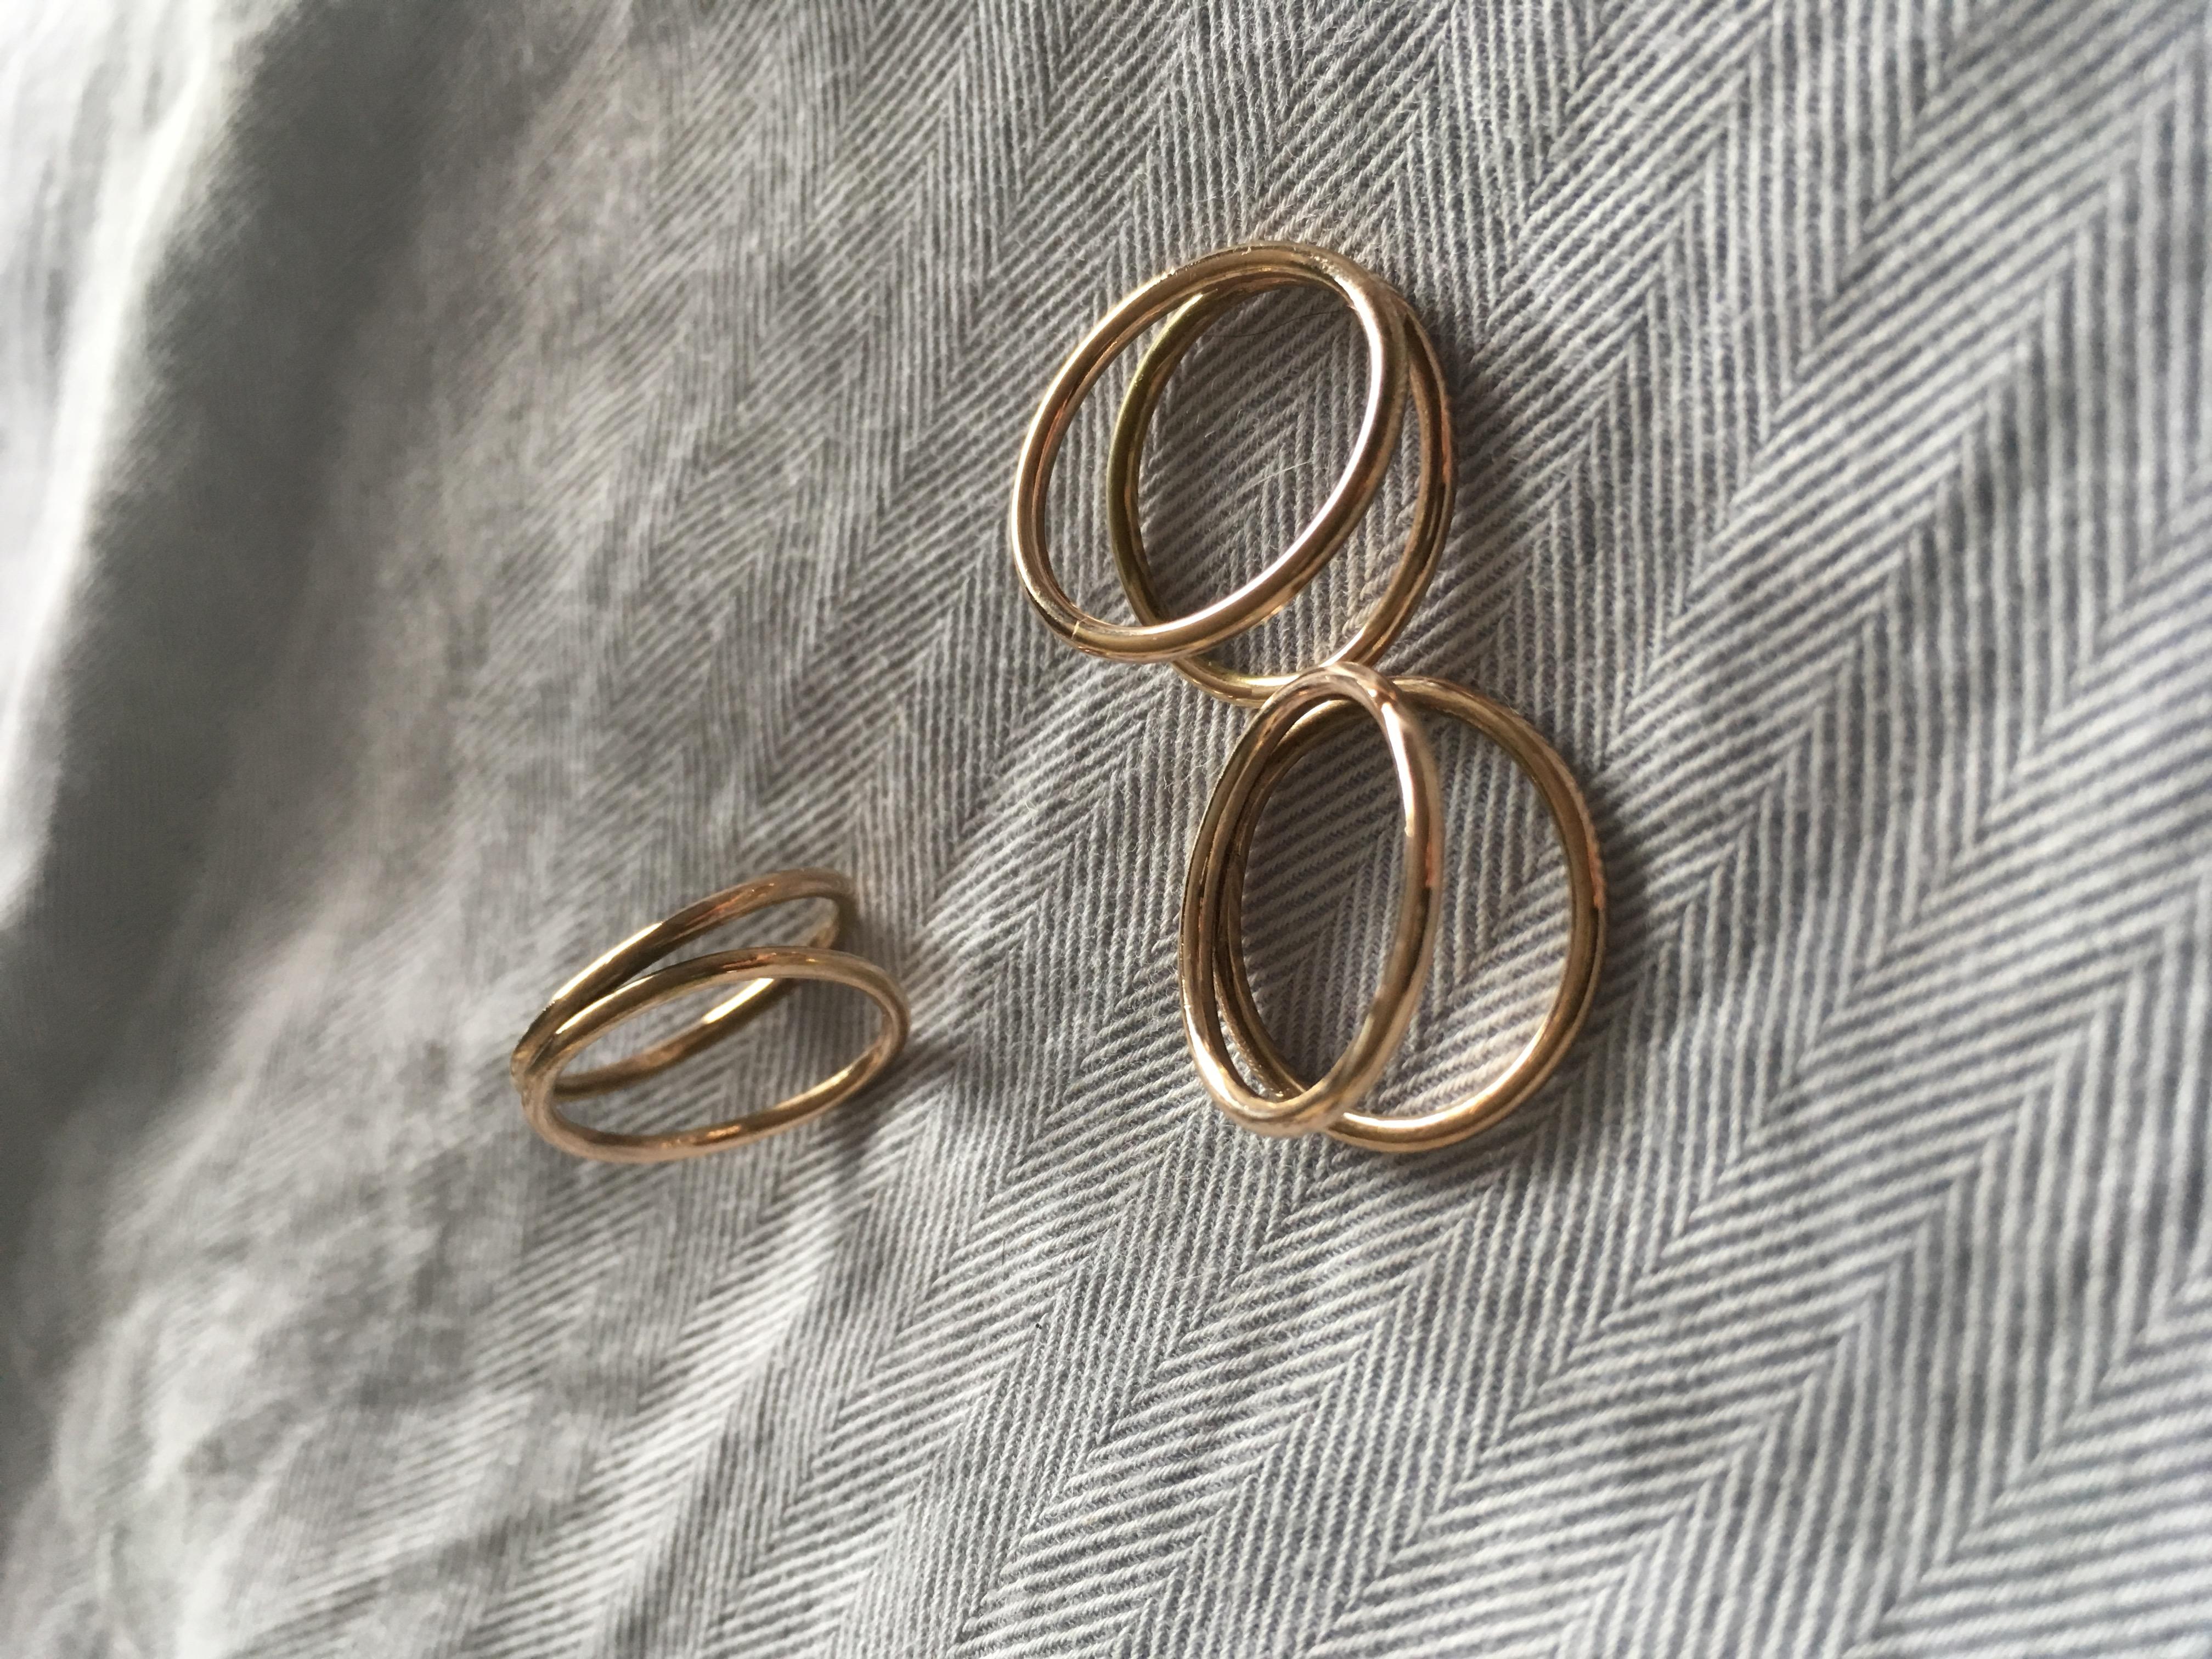 Intersecting Circle Rings